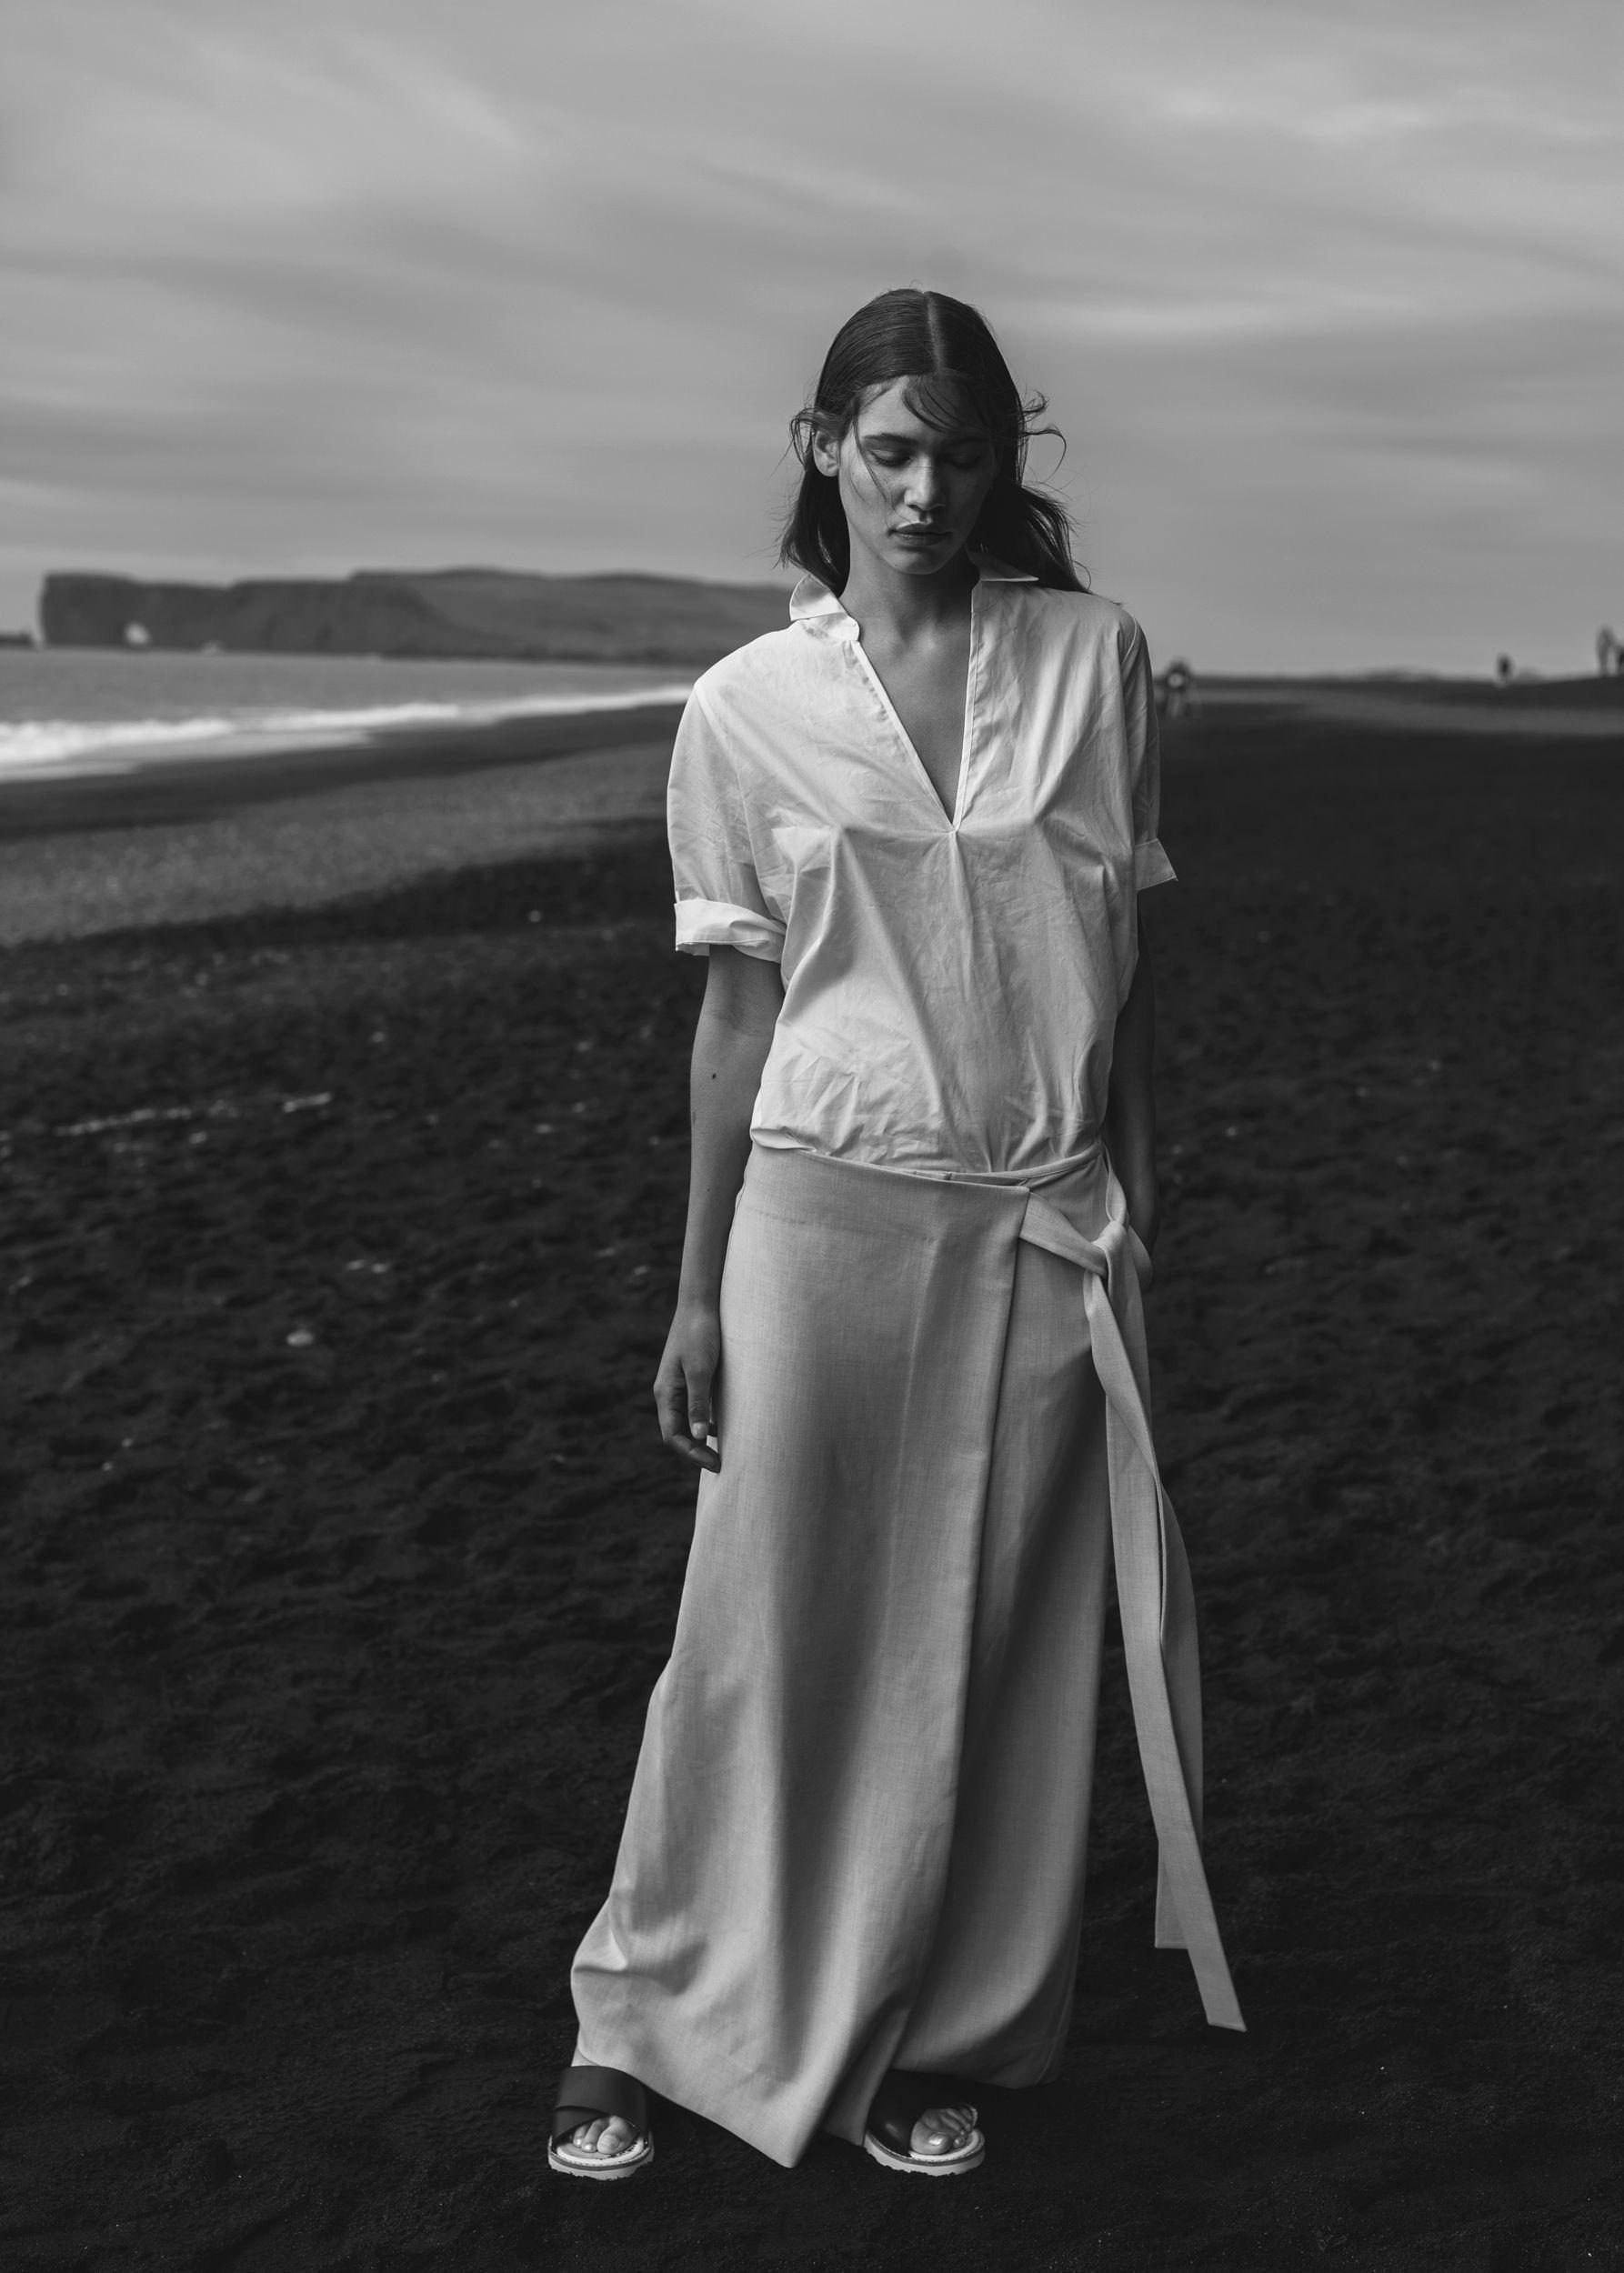 Kaya Wilkins By Janne Rugland Tasty Blacks Muse Fashion Photography Photographs High